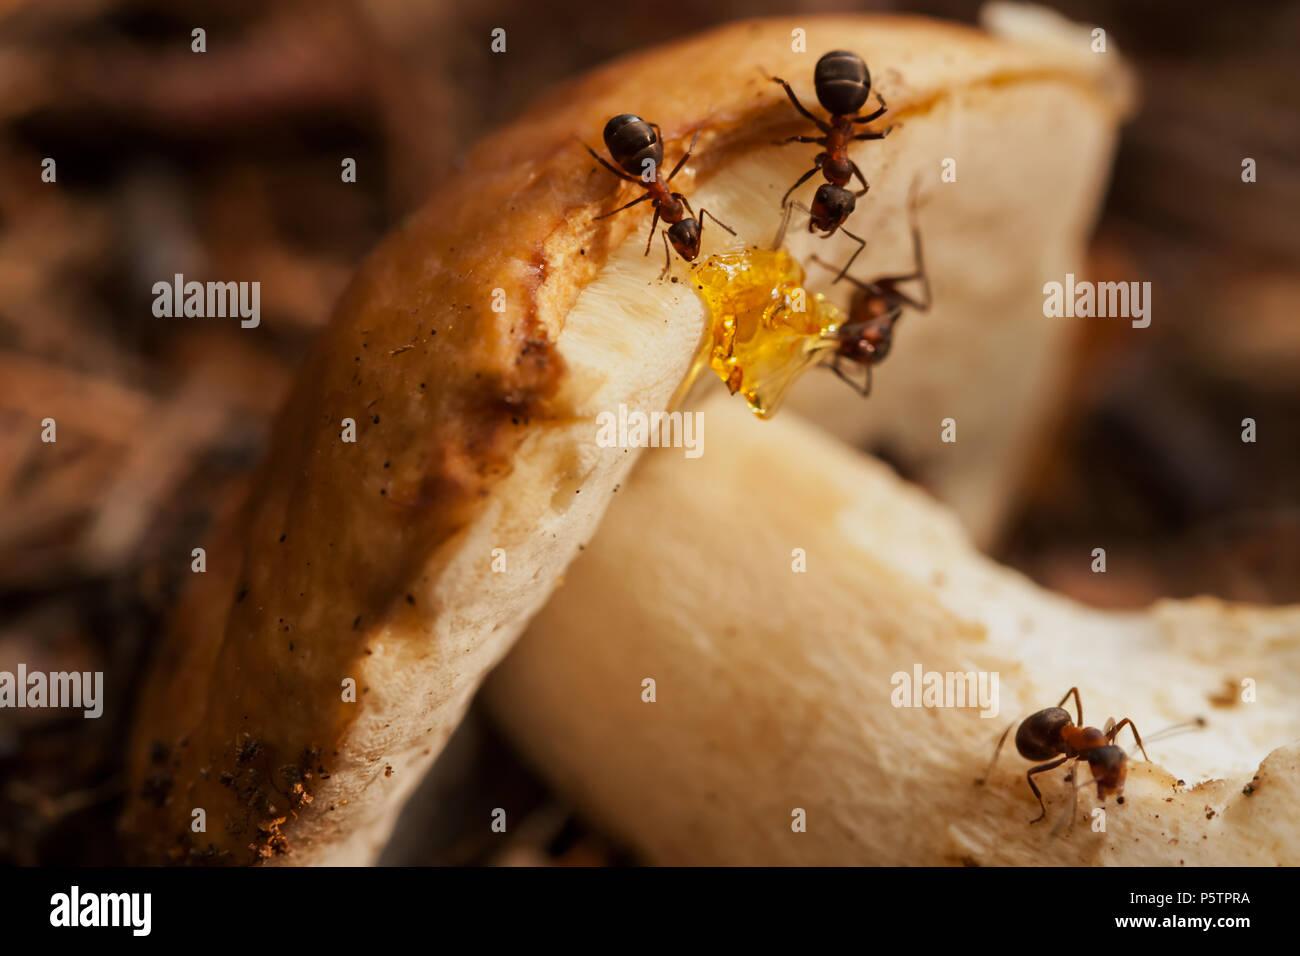 Hardworking ants work with mushroom. Teamwork - Stock Image